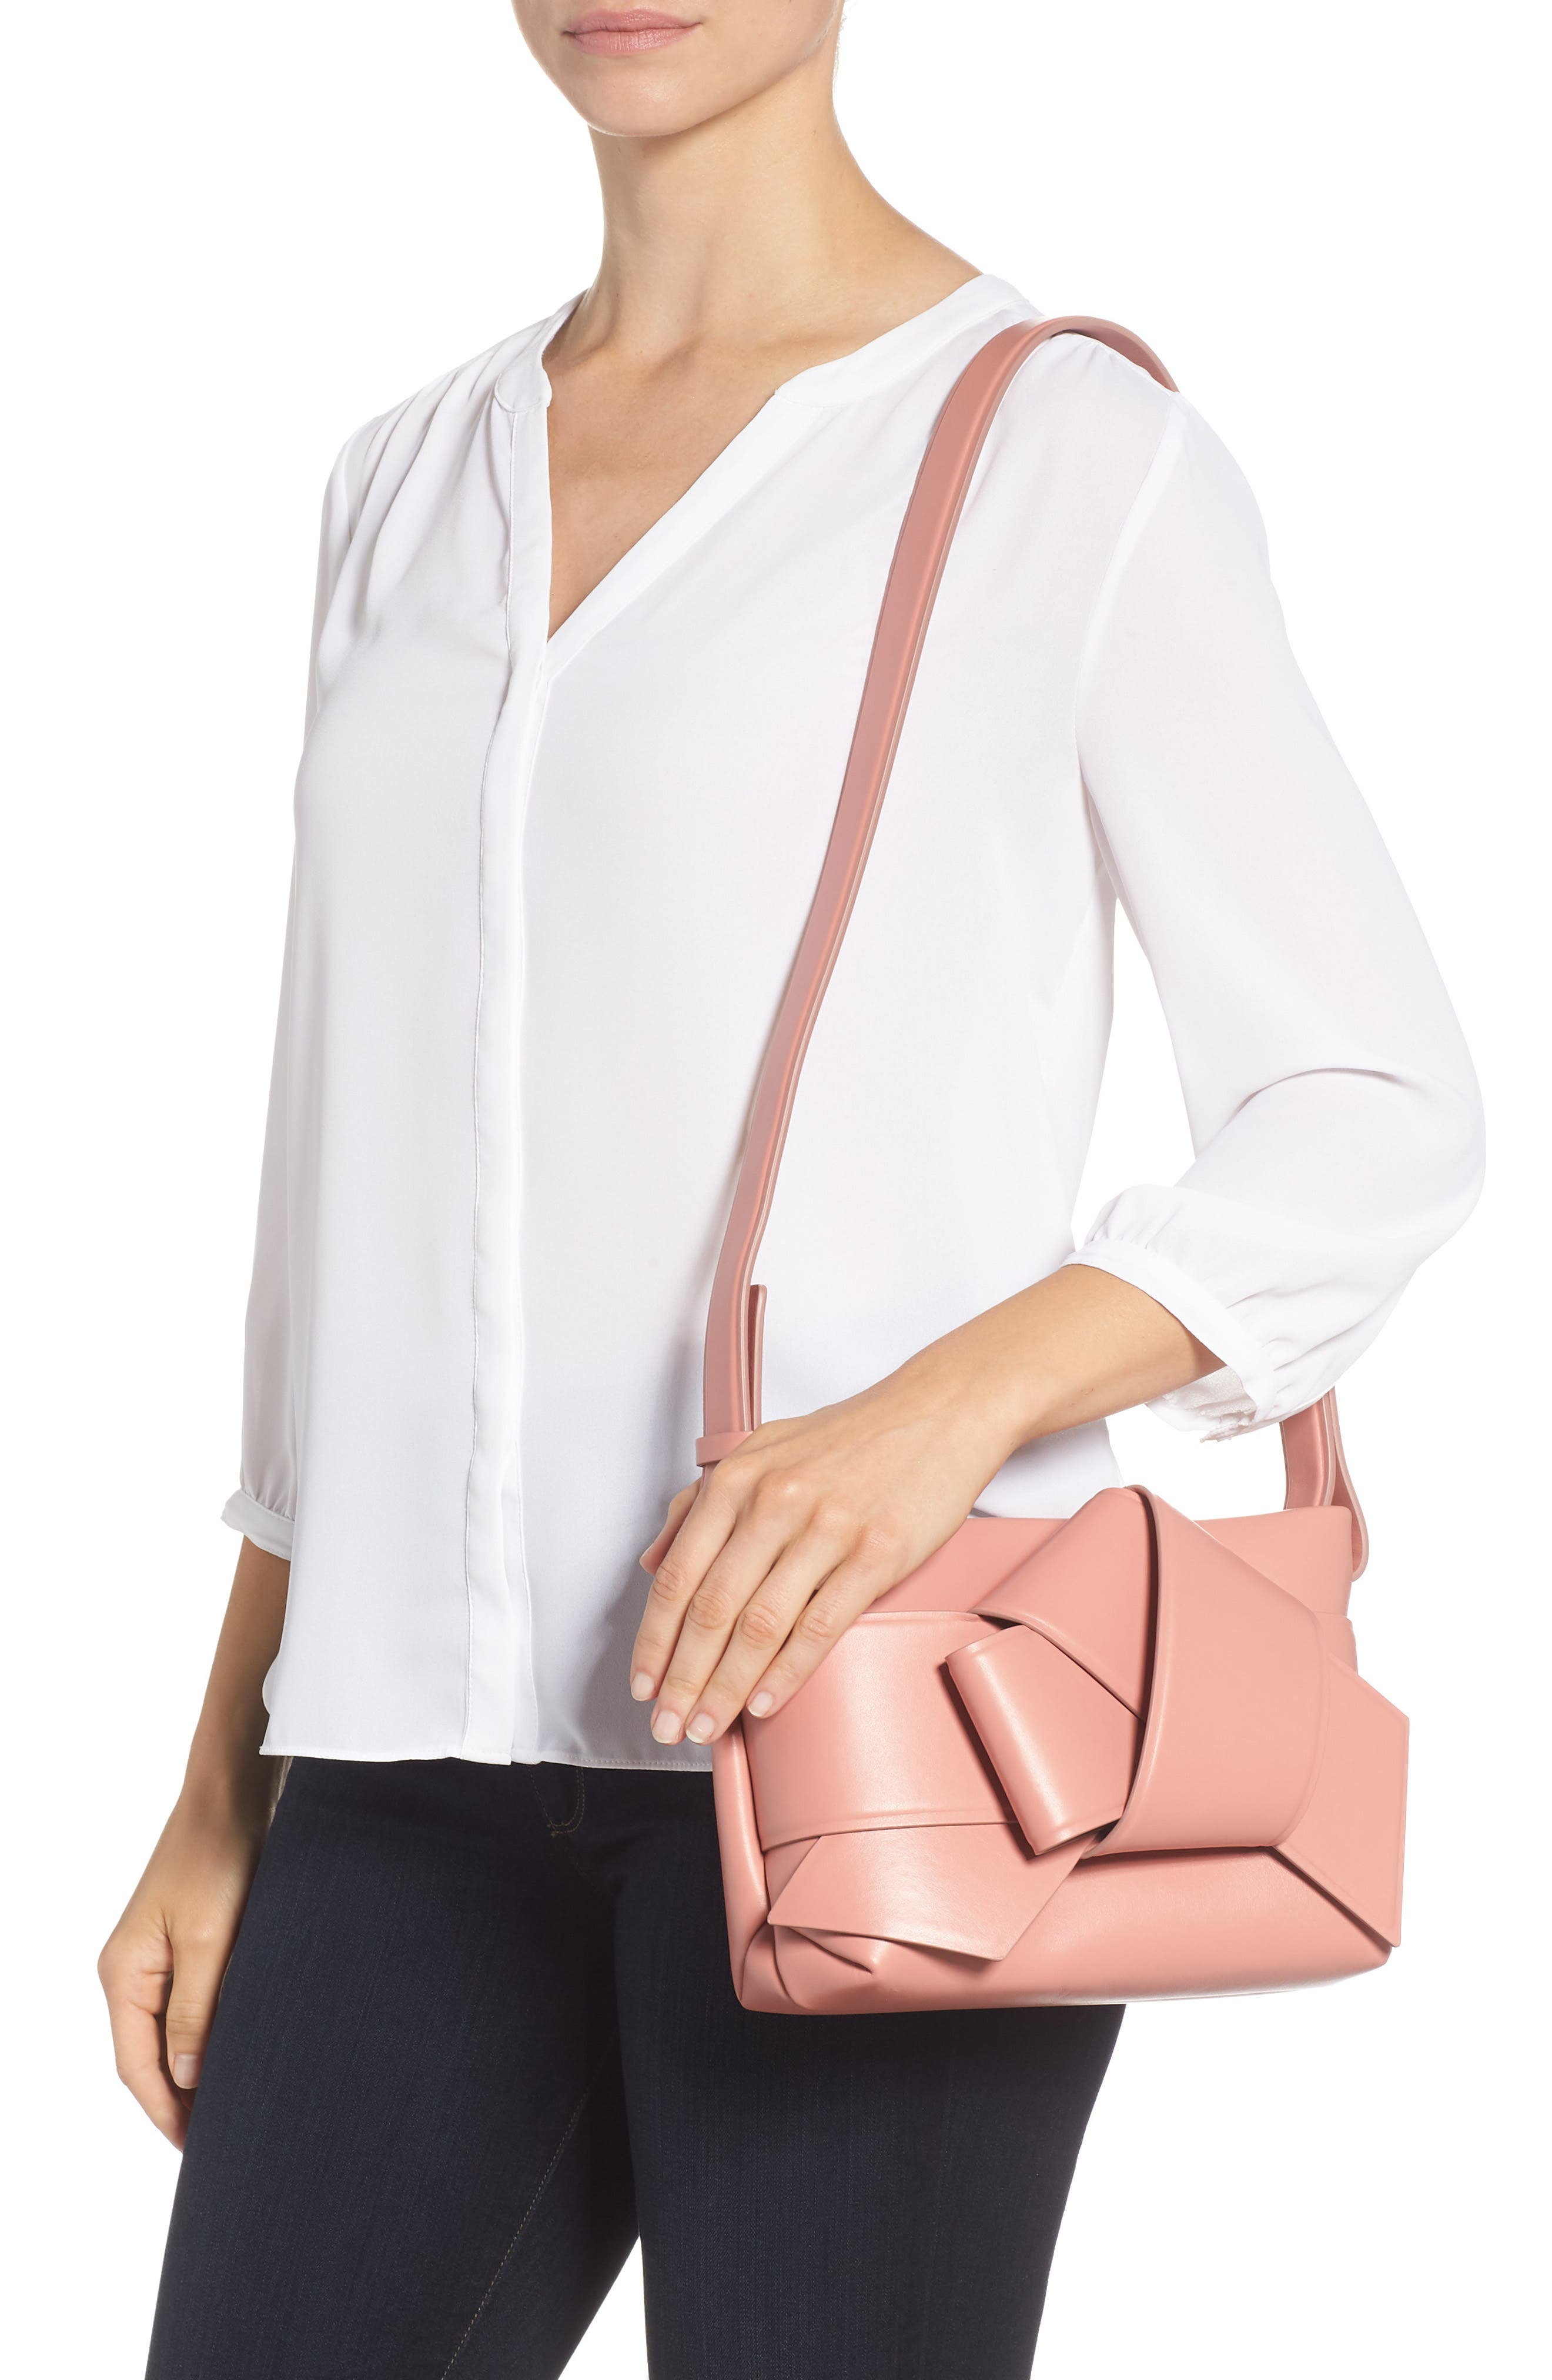 Musubi Knot Leather Handbag,                             Alternate thumbnail 2, color,                             PINK